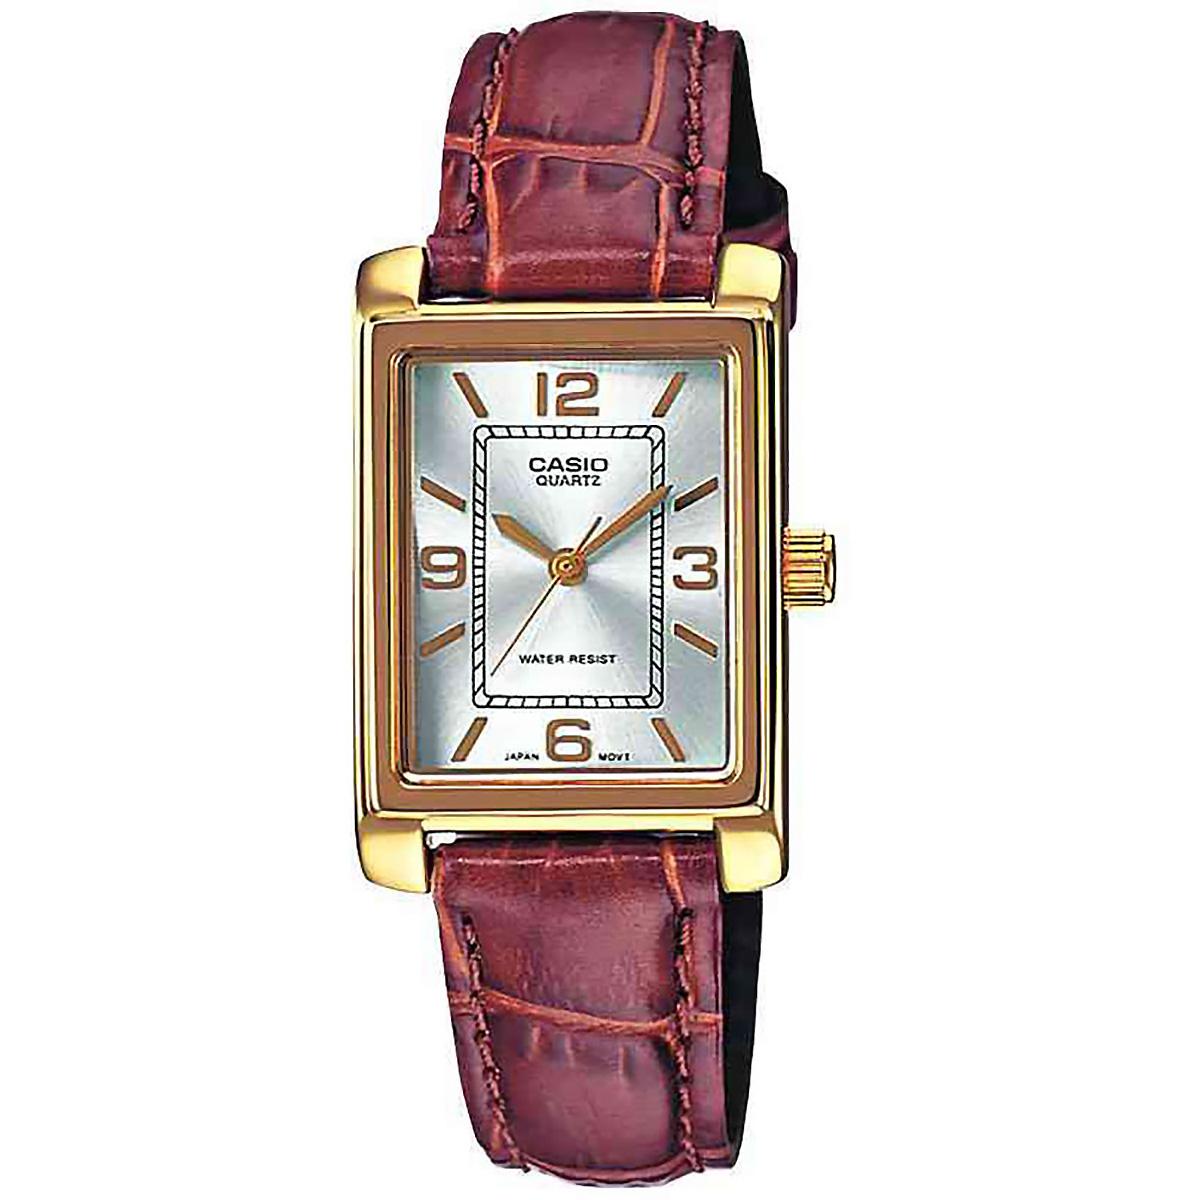 casio damenuhr ltp 1234pgl 7a armbanduhr leder silber braun gold watch neu ovp ebay. Black Bedroom Furniture Sets. Home Design Ideas